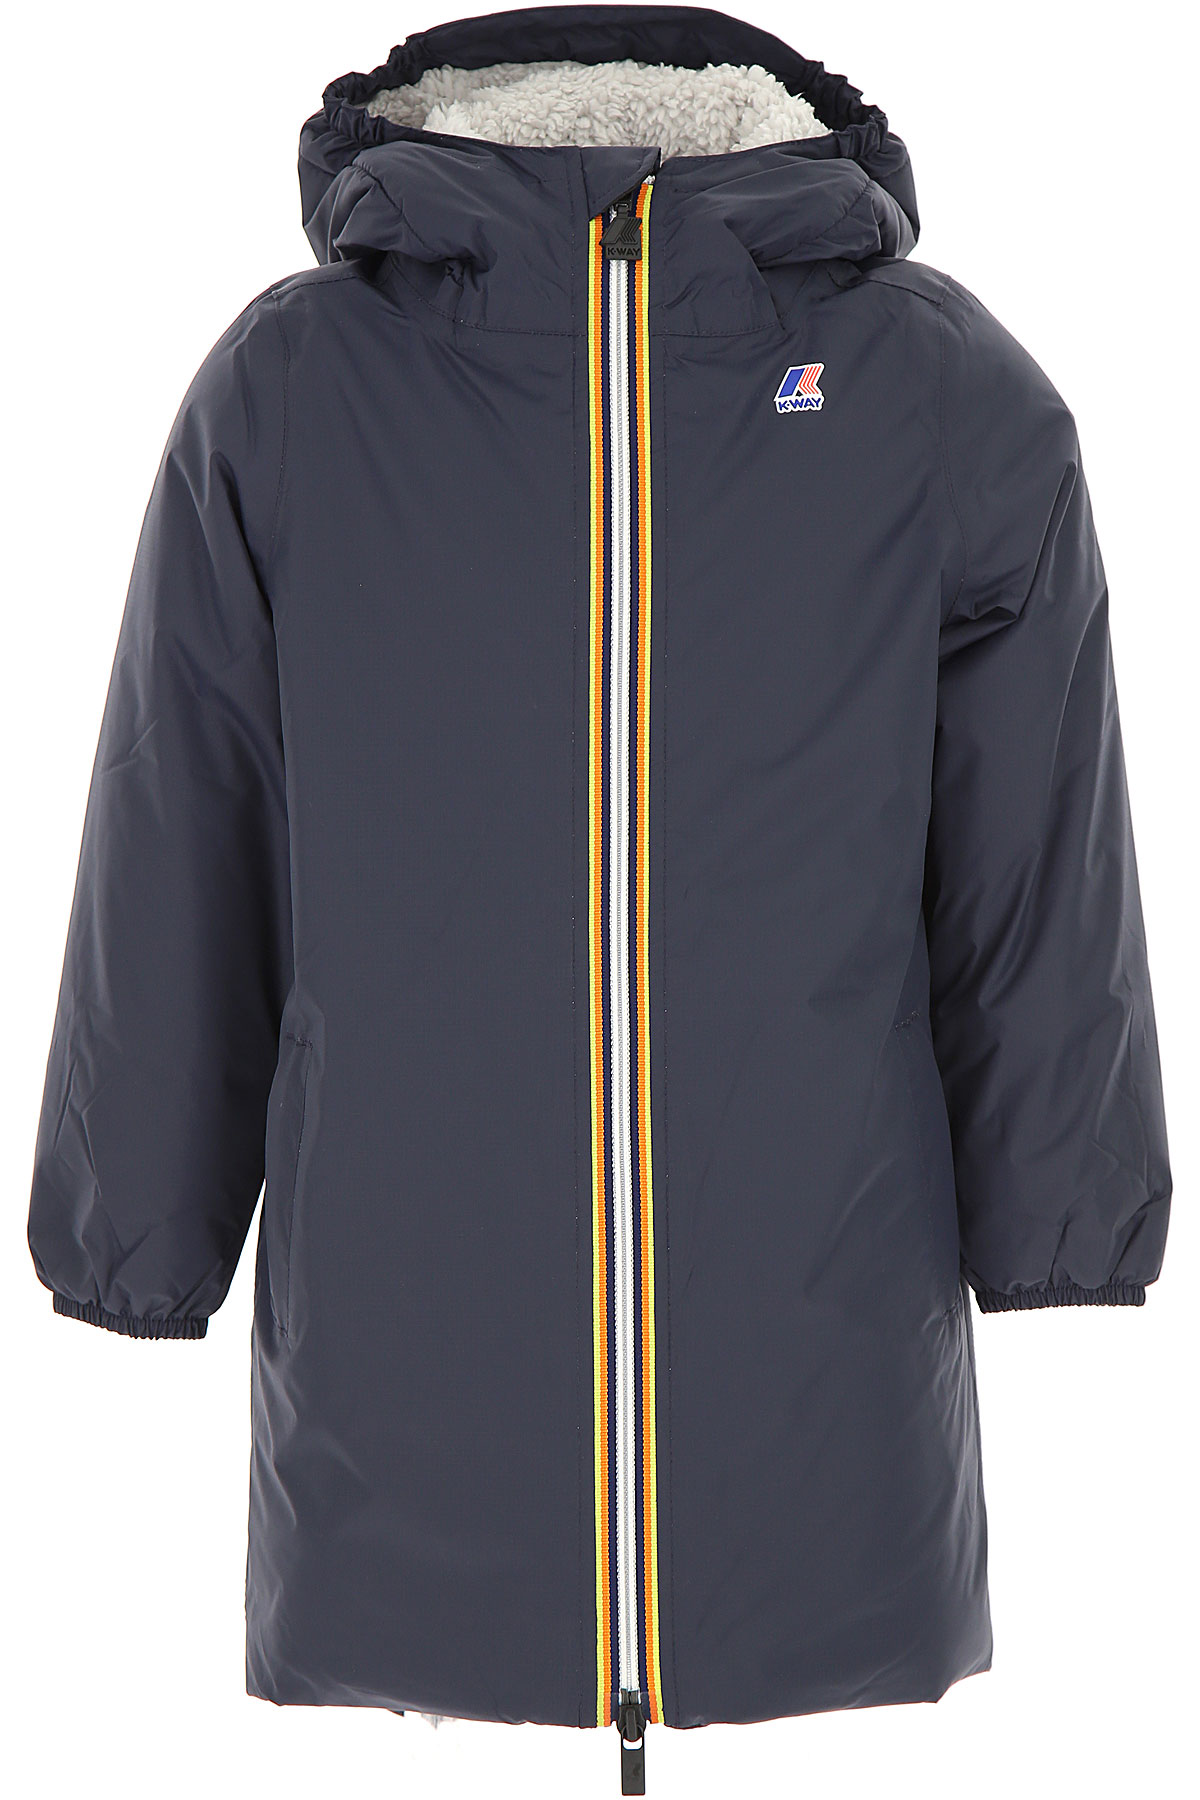 Image of K-Way Boys Down Jacket for Kids, Puffer Ski Jacket, Blue, polyamide, 2017, 4Y 6Y 8Y